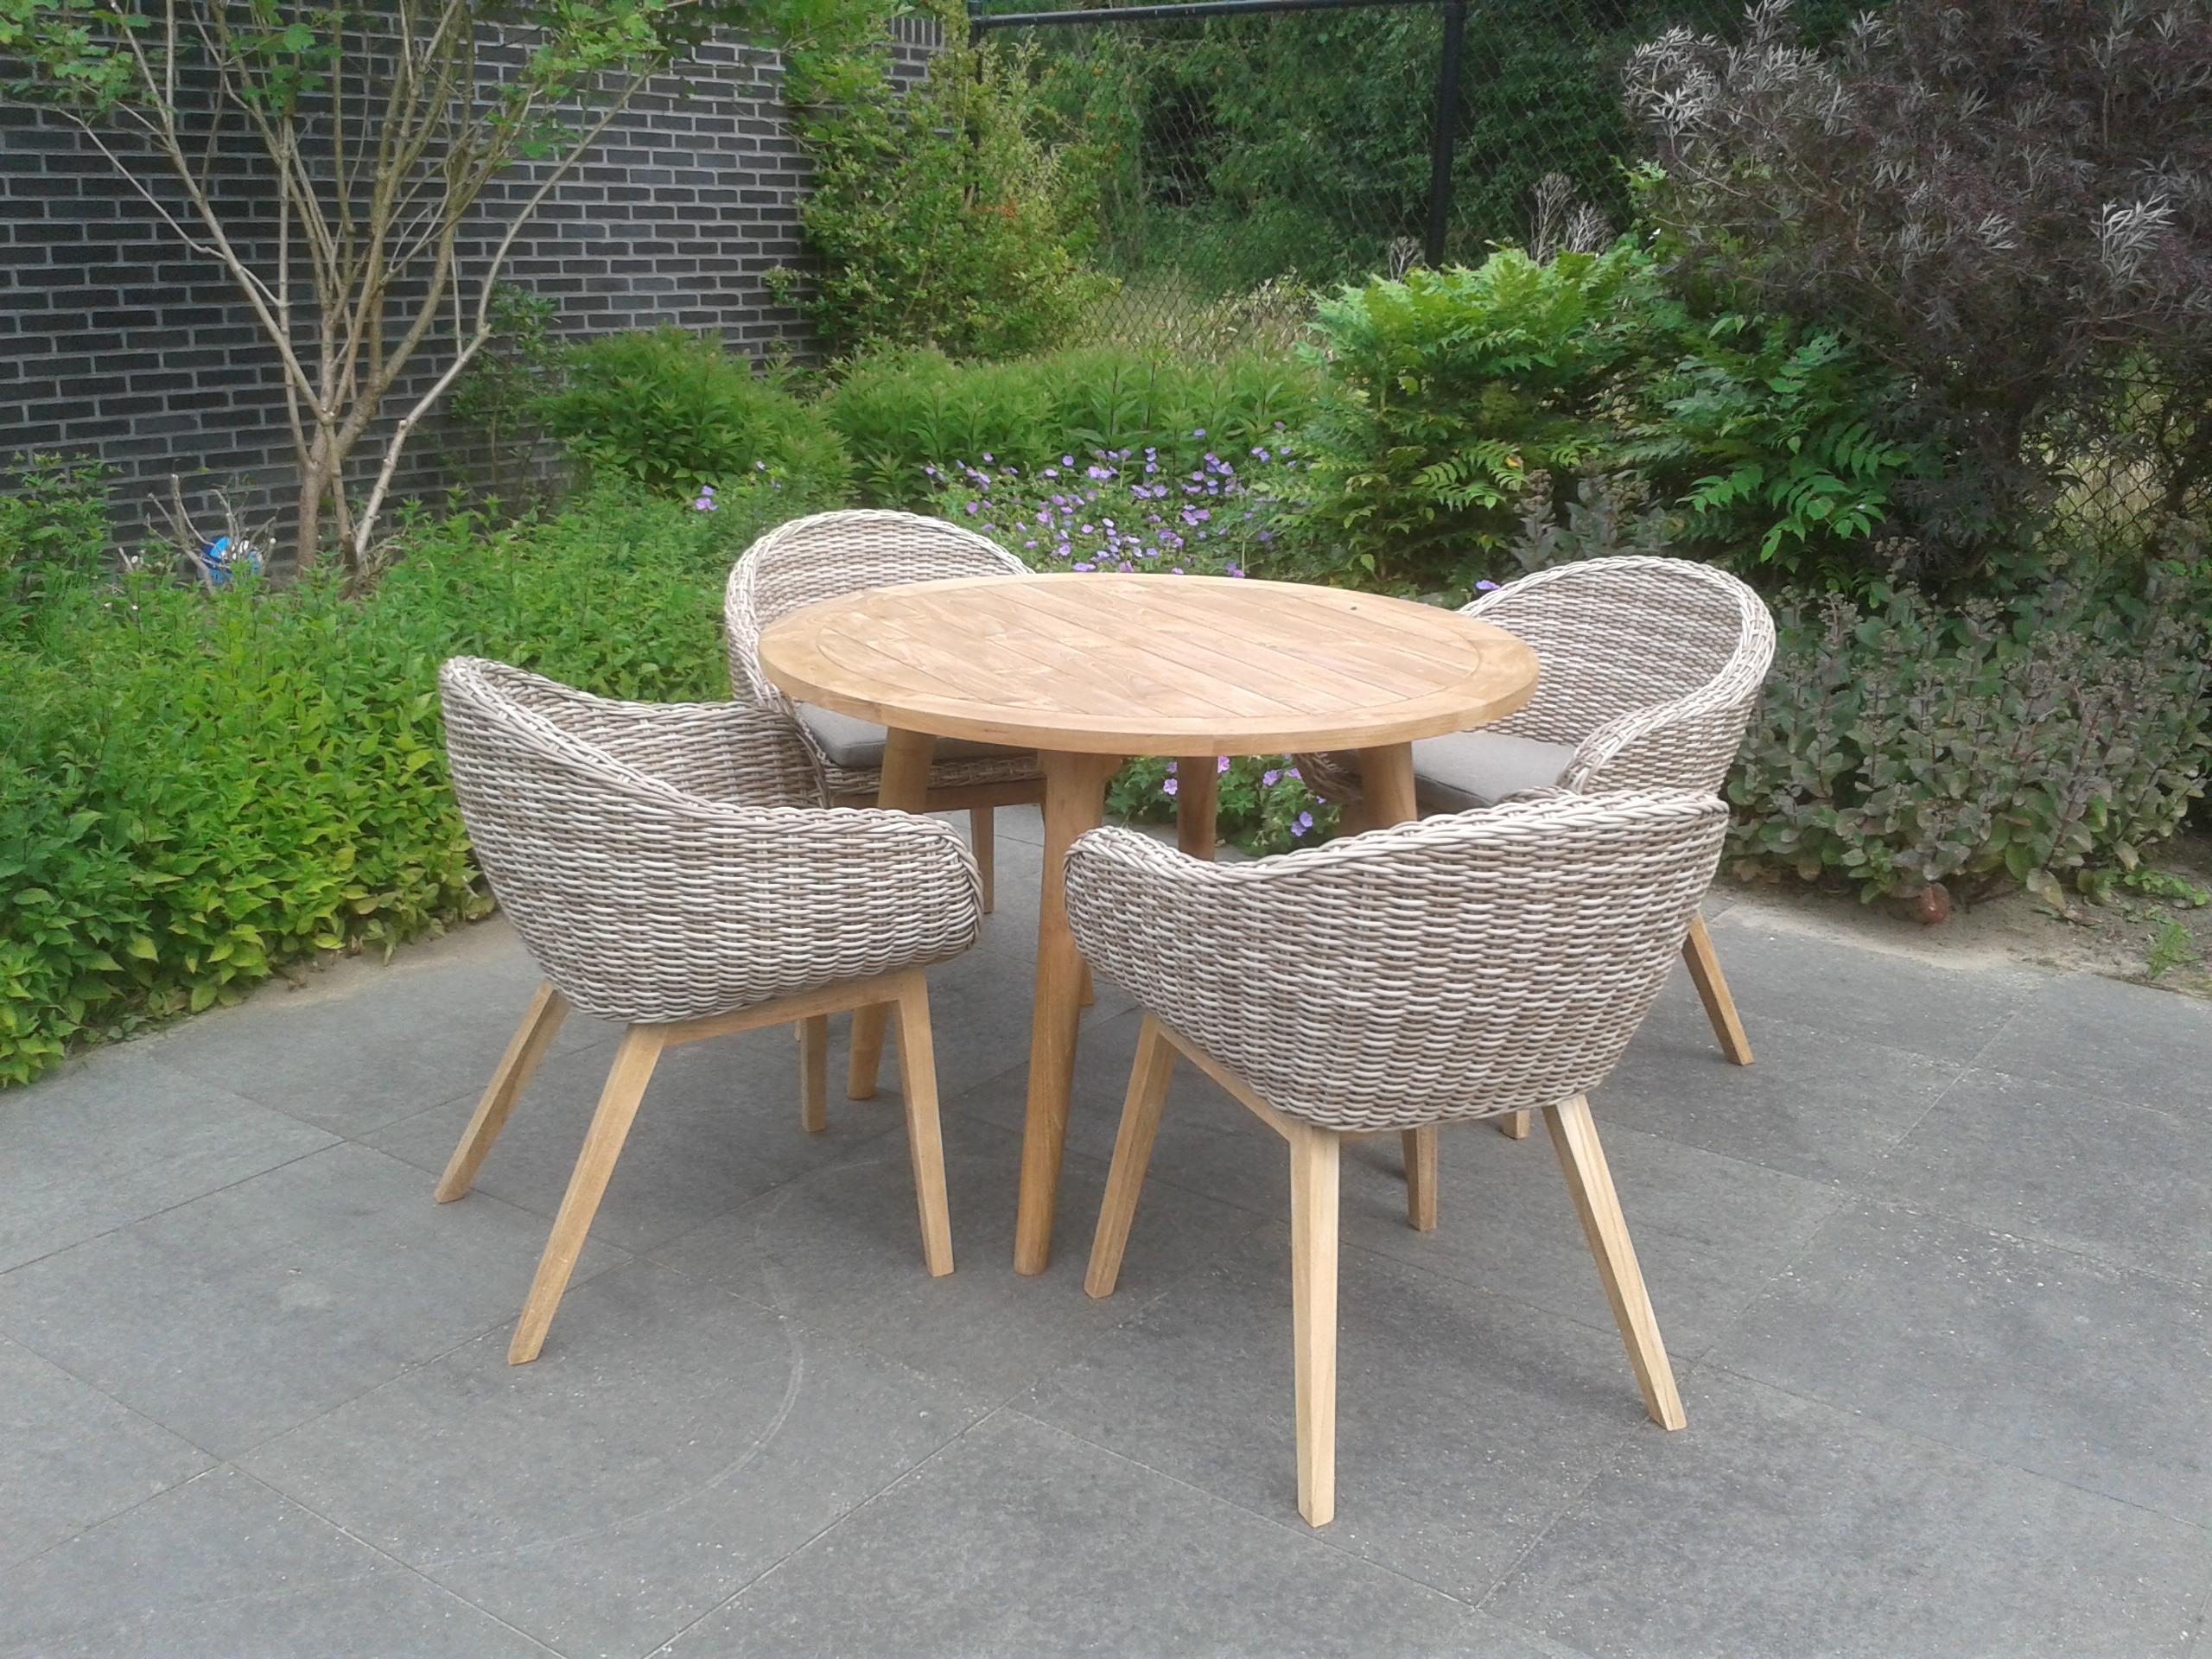 Kunststof rotan tuinstoelen tuinstoelen rietlook idee n over rieten stoelen op rotan en wit - Opslag idee lounge ...